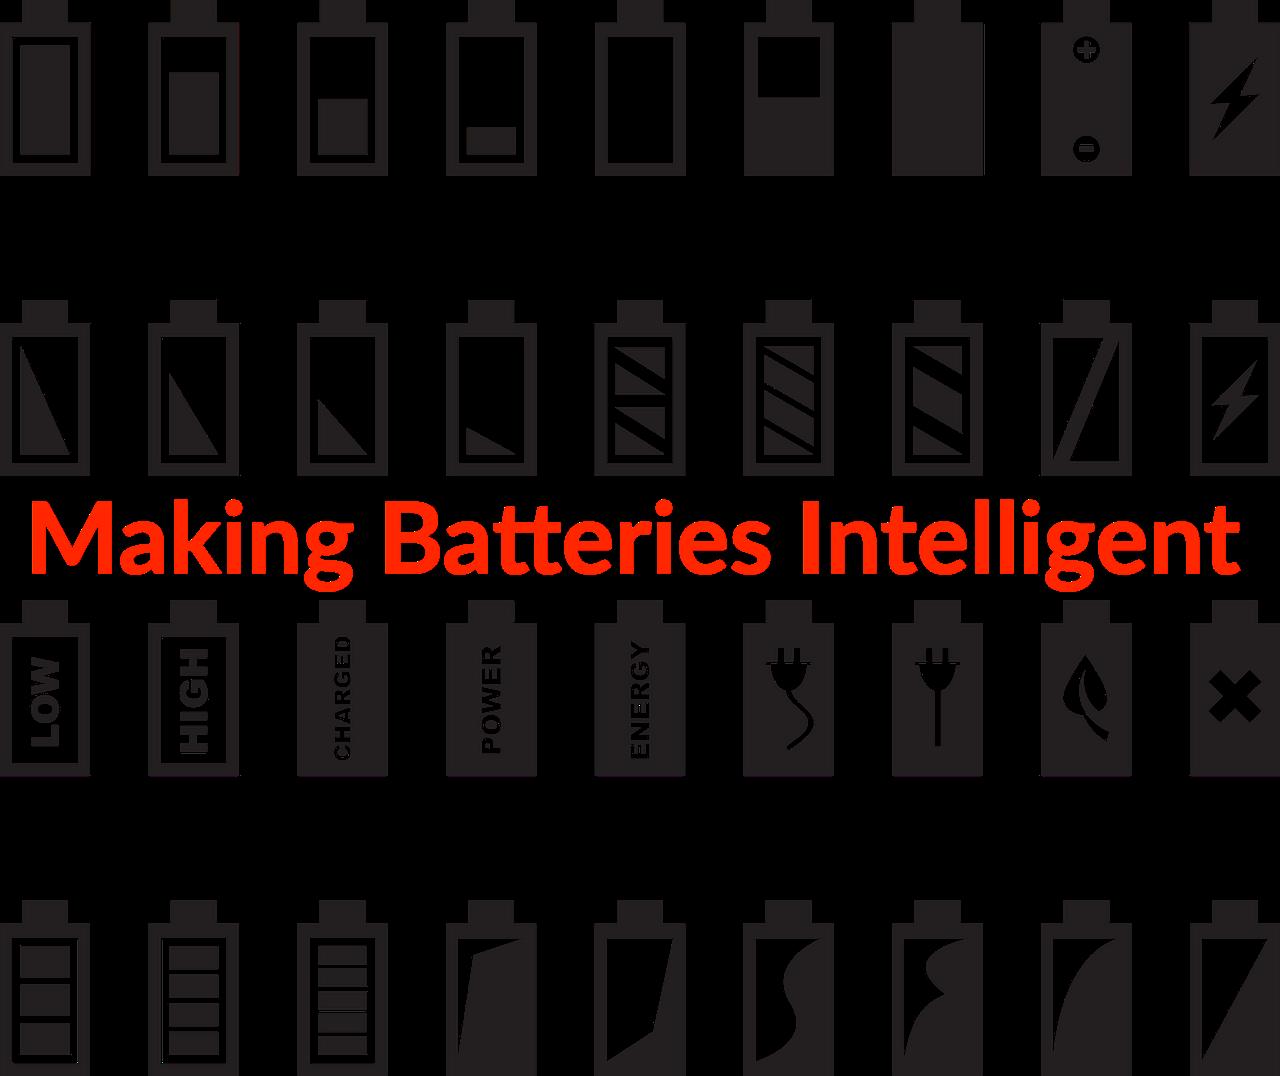 Making Batteries Intelligent